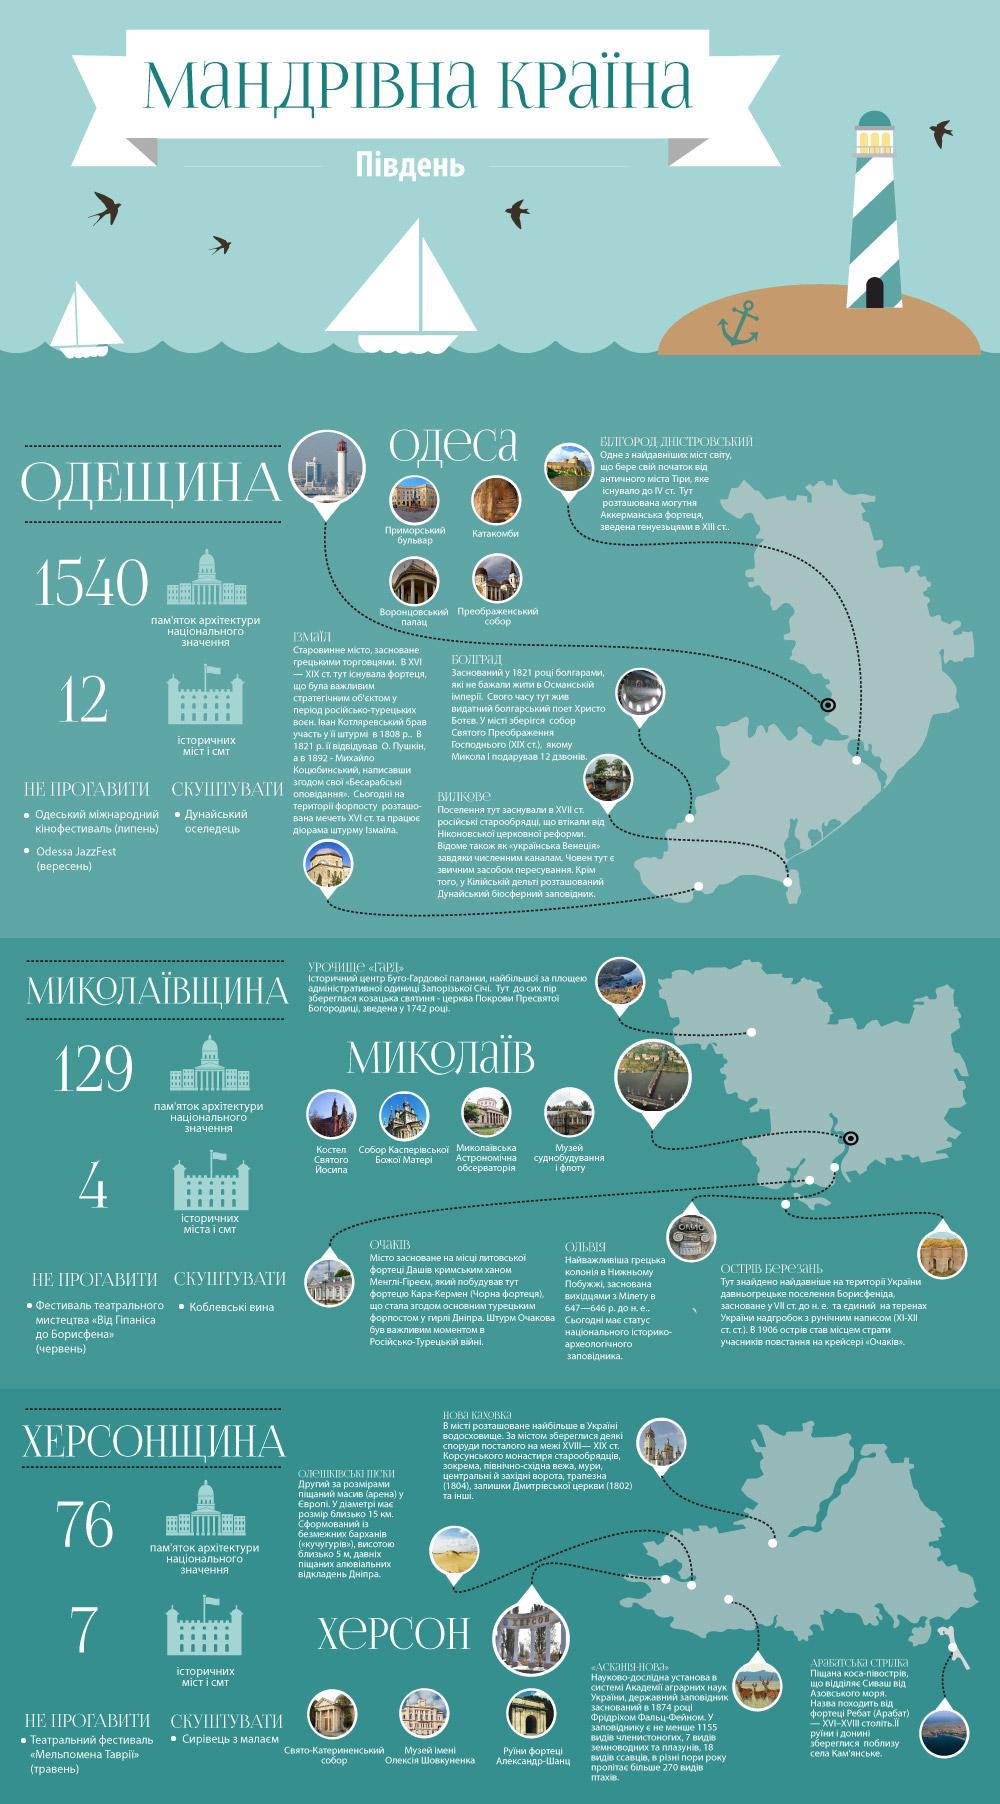 picture_pivden-ukrainy_4865_p0.jpg